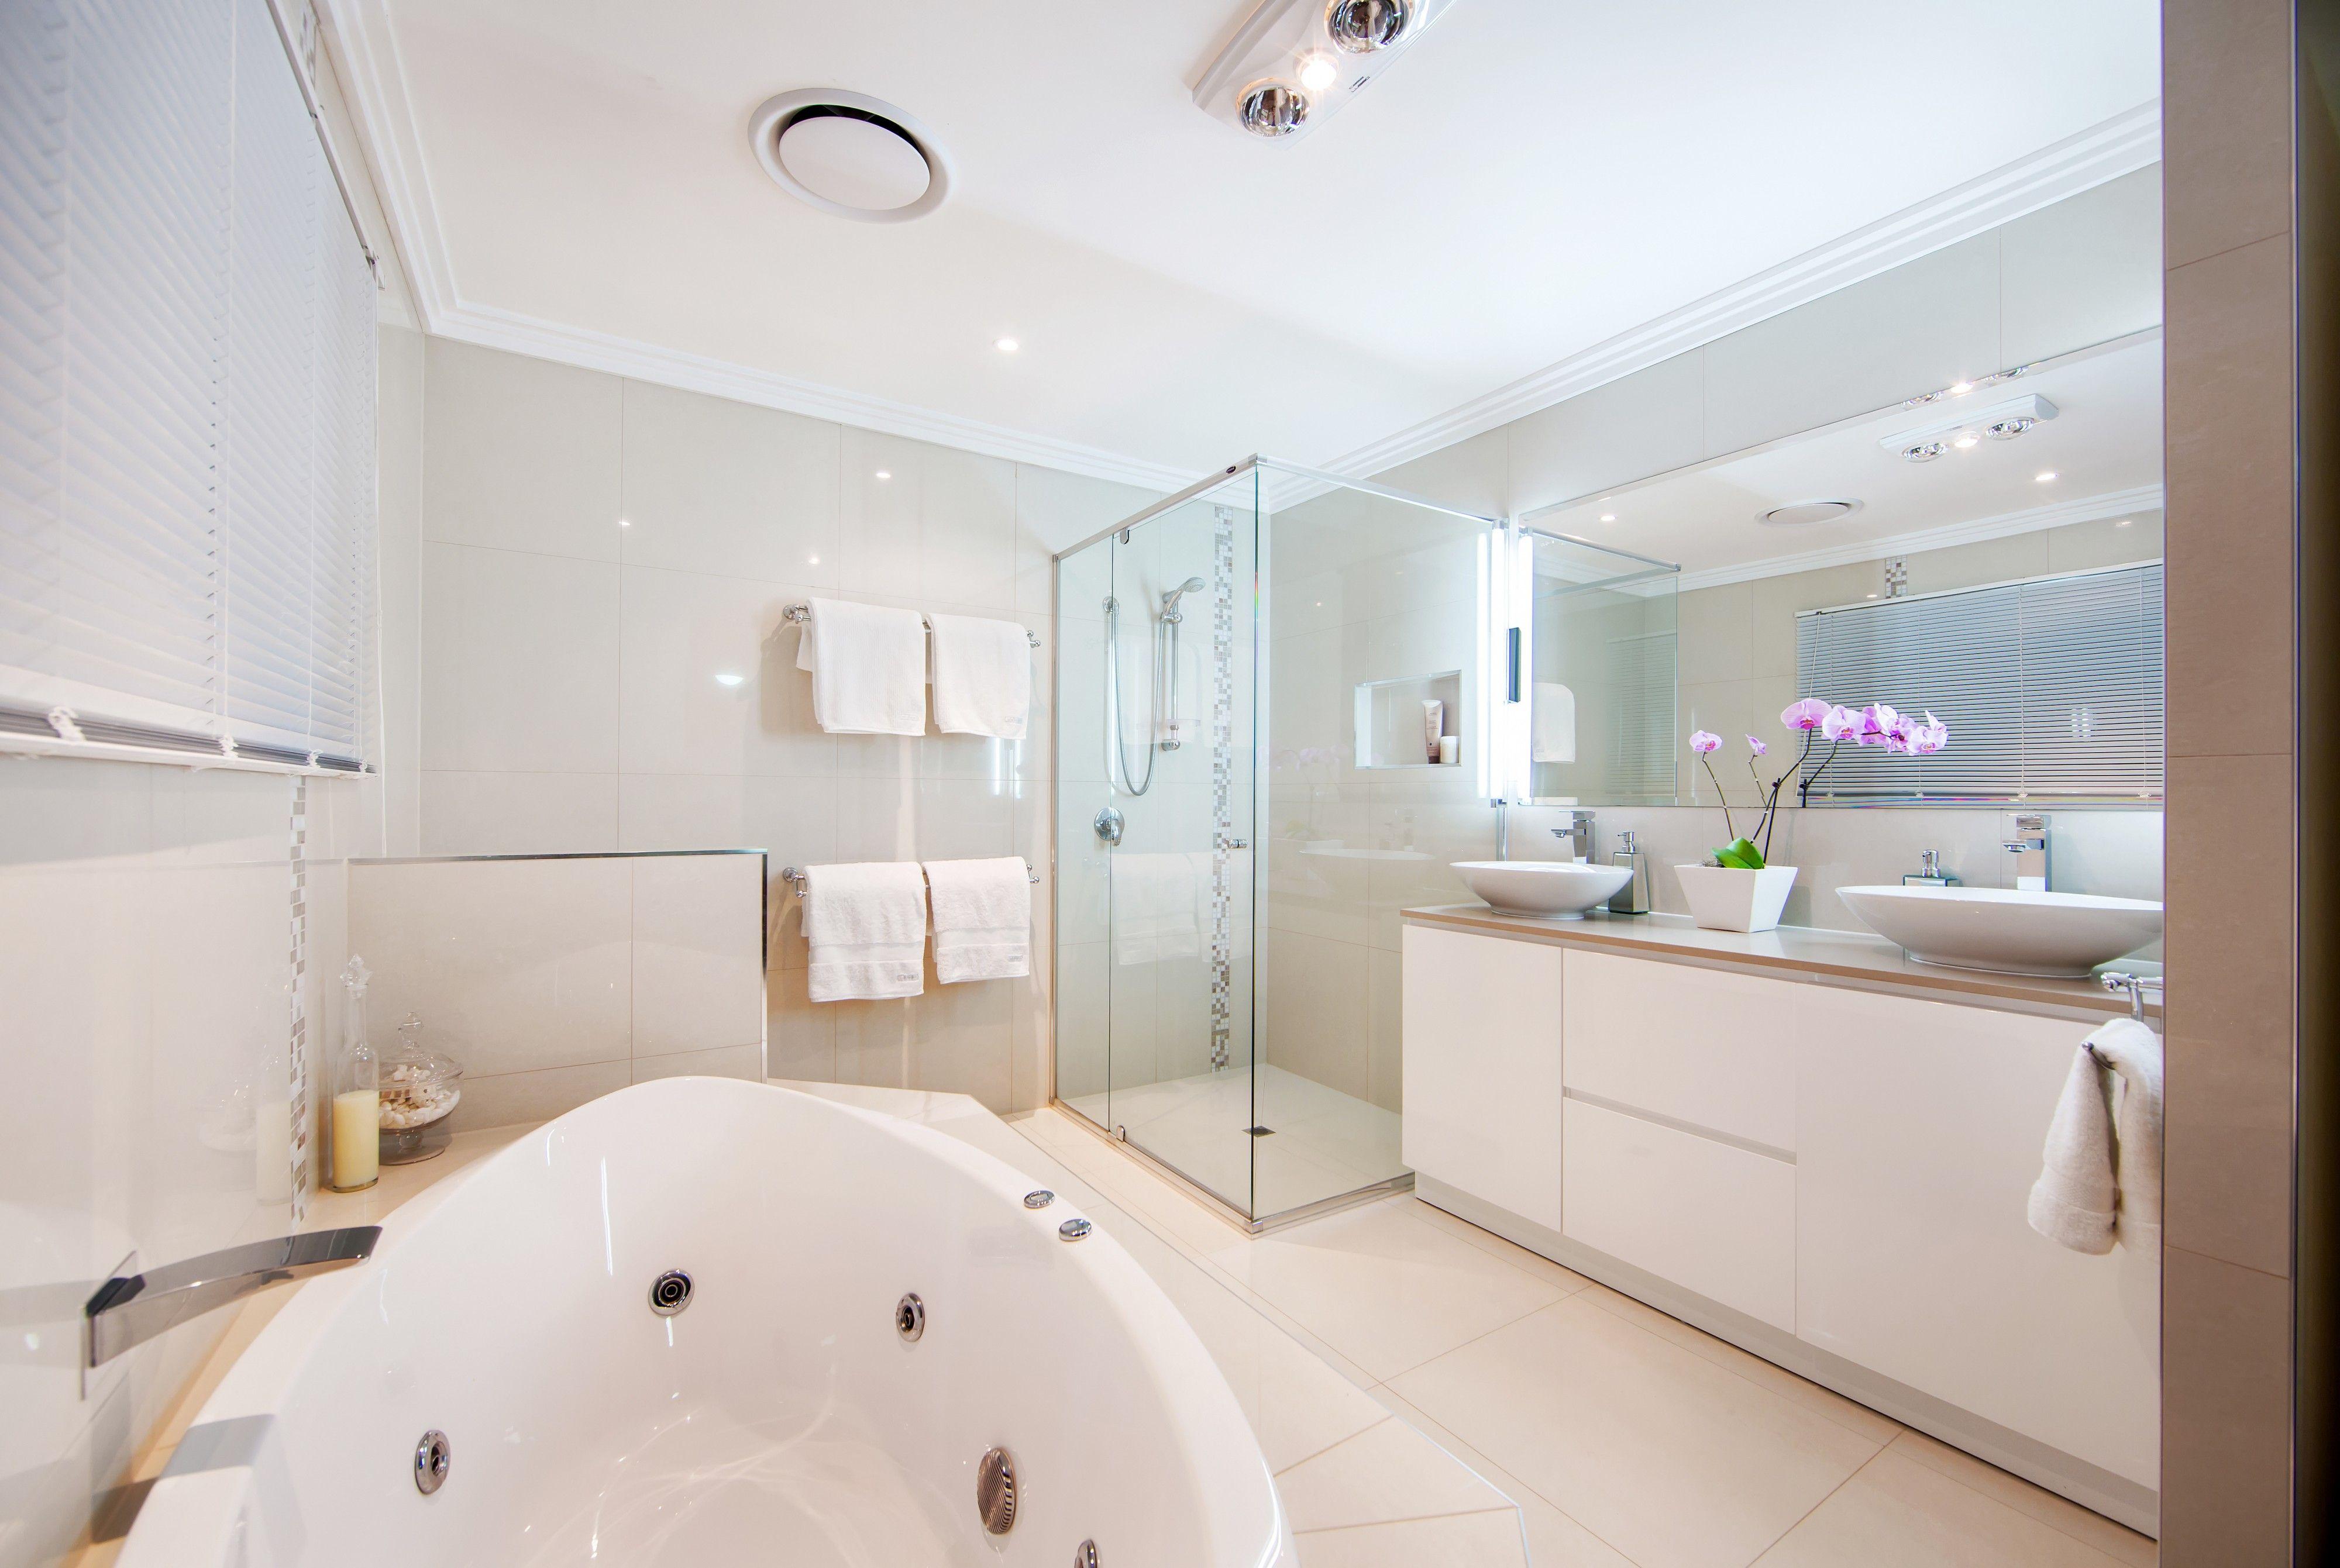 Gold Coast Bathroom Renovations   Highlife Homes Gallery   Pinterest ...